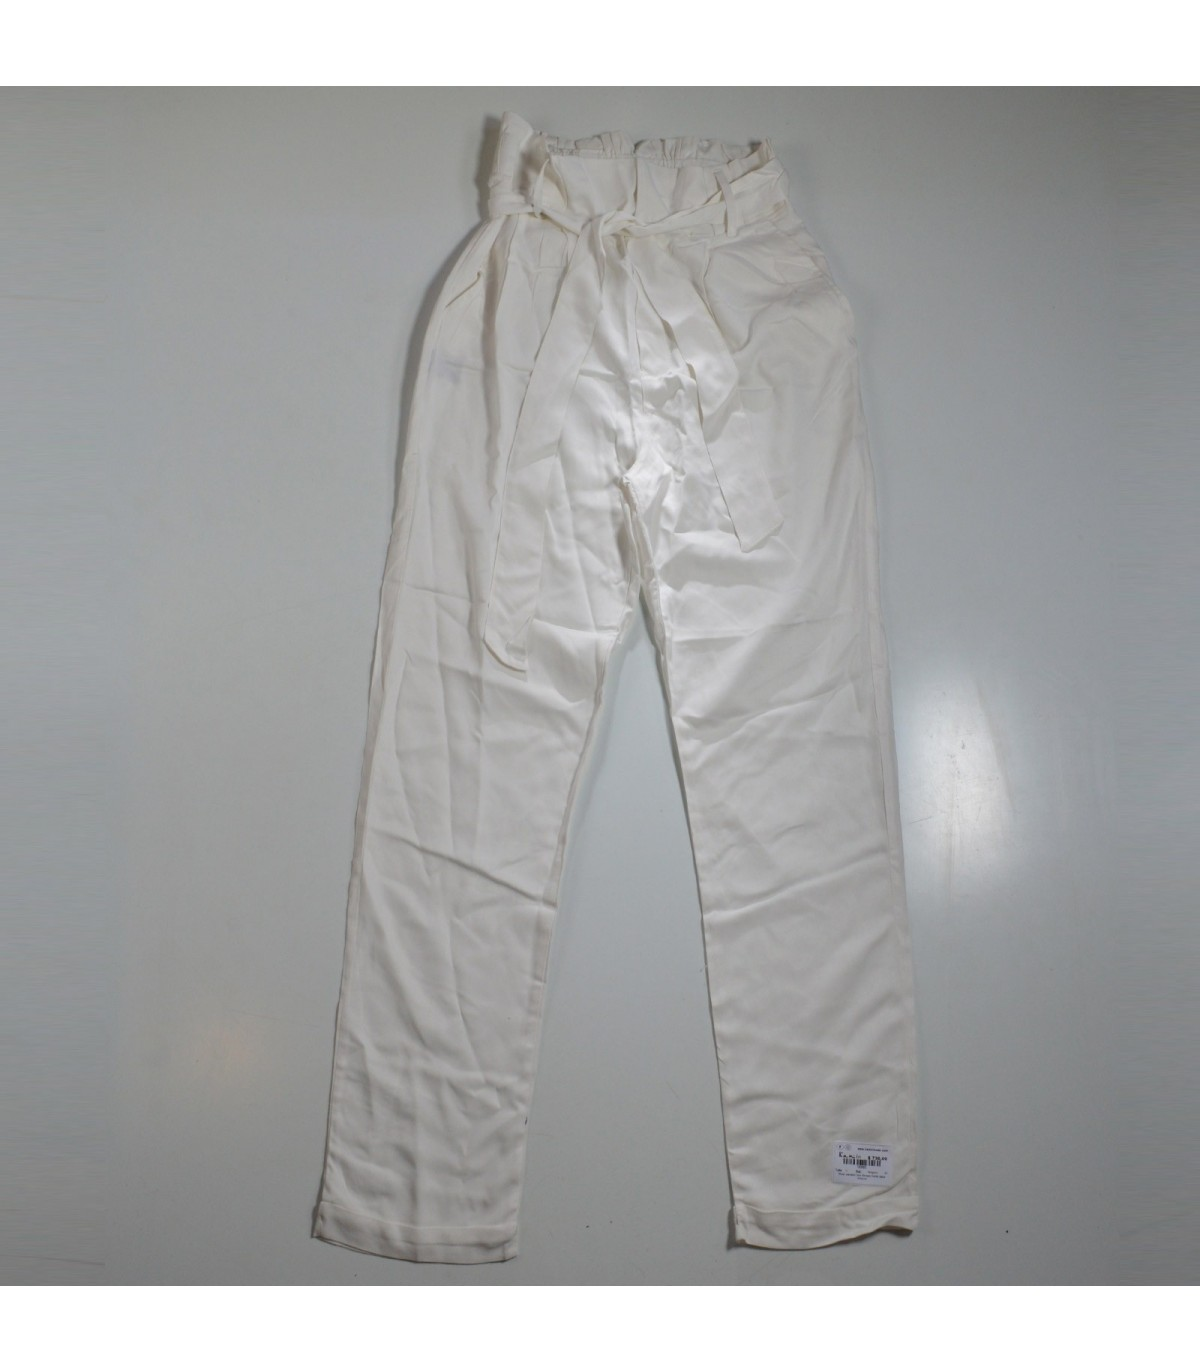 Mujer Pantalon Tipo Fibrana Frente Tabla Cinturon